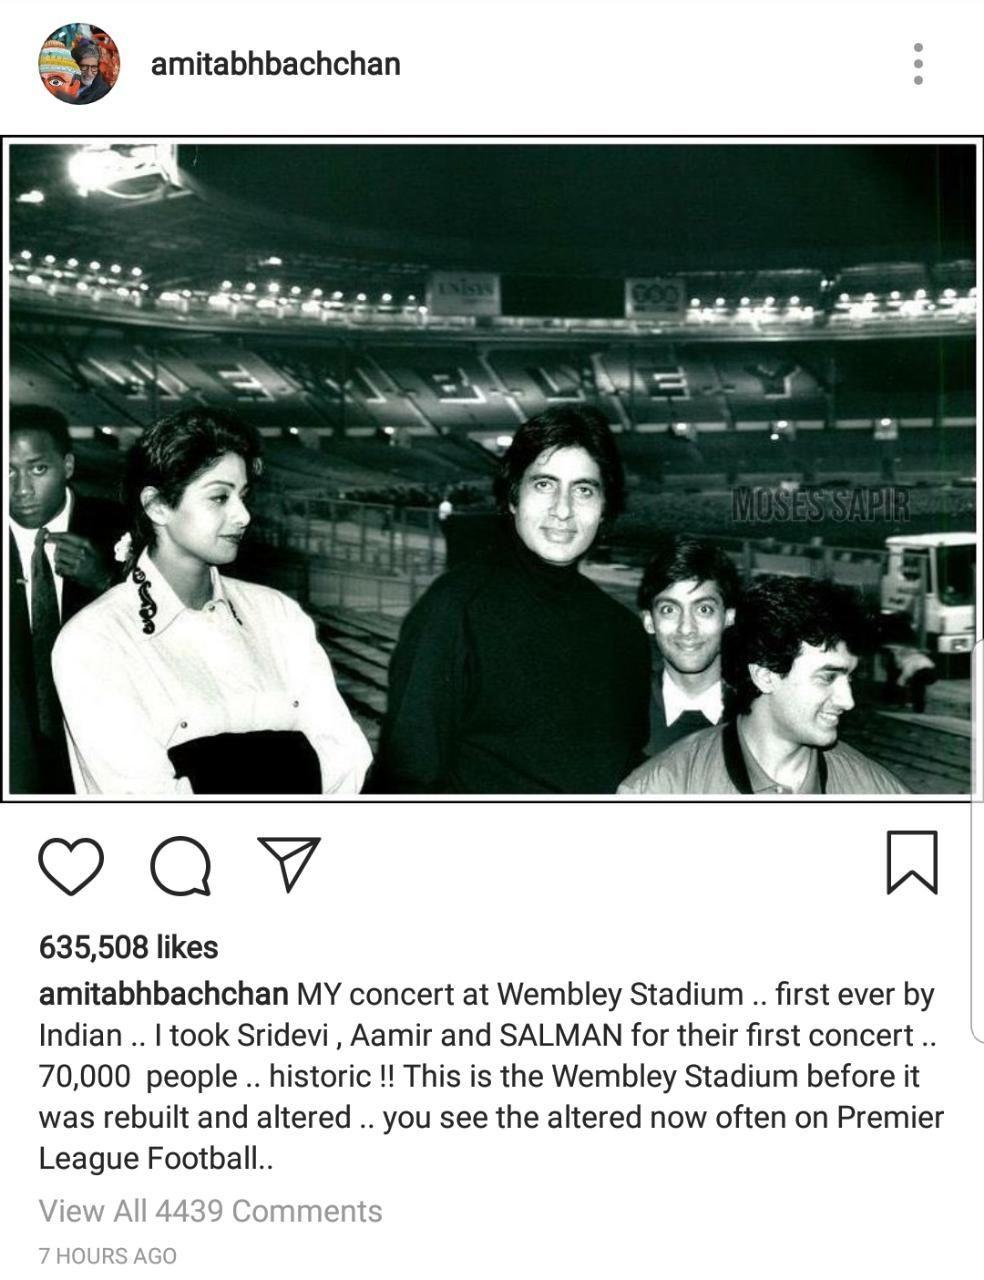 Amitabh Bachchan Kenang Sridevi, Salman dan Aamir Khan Muda Lewat Foto